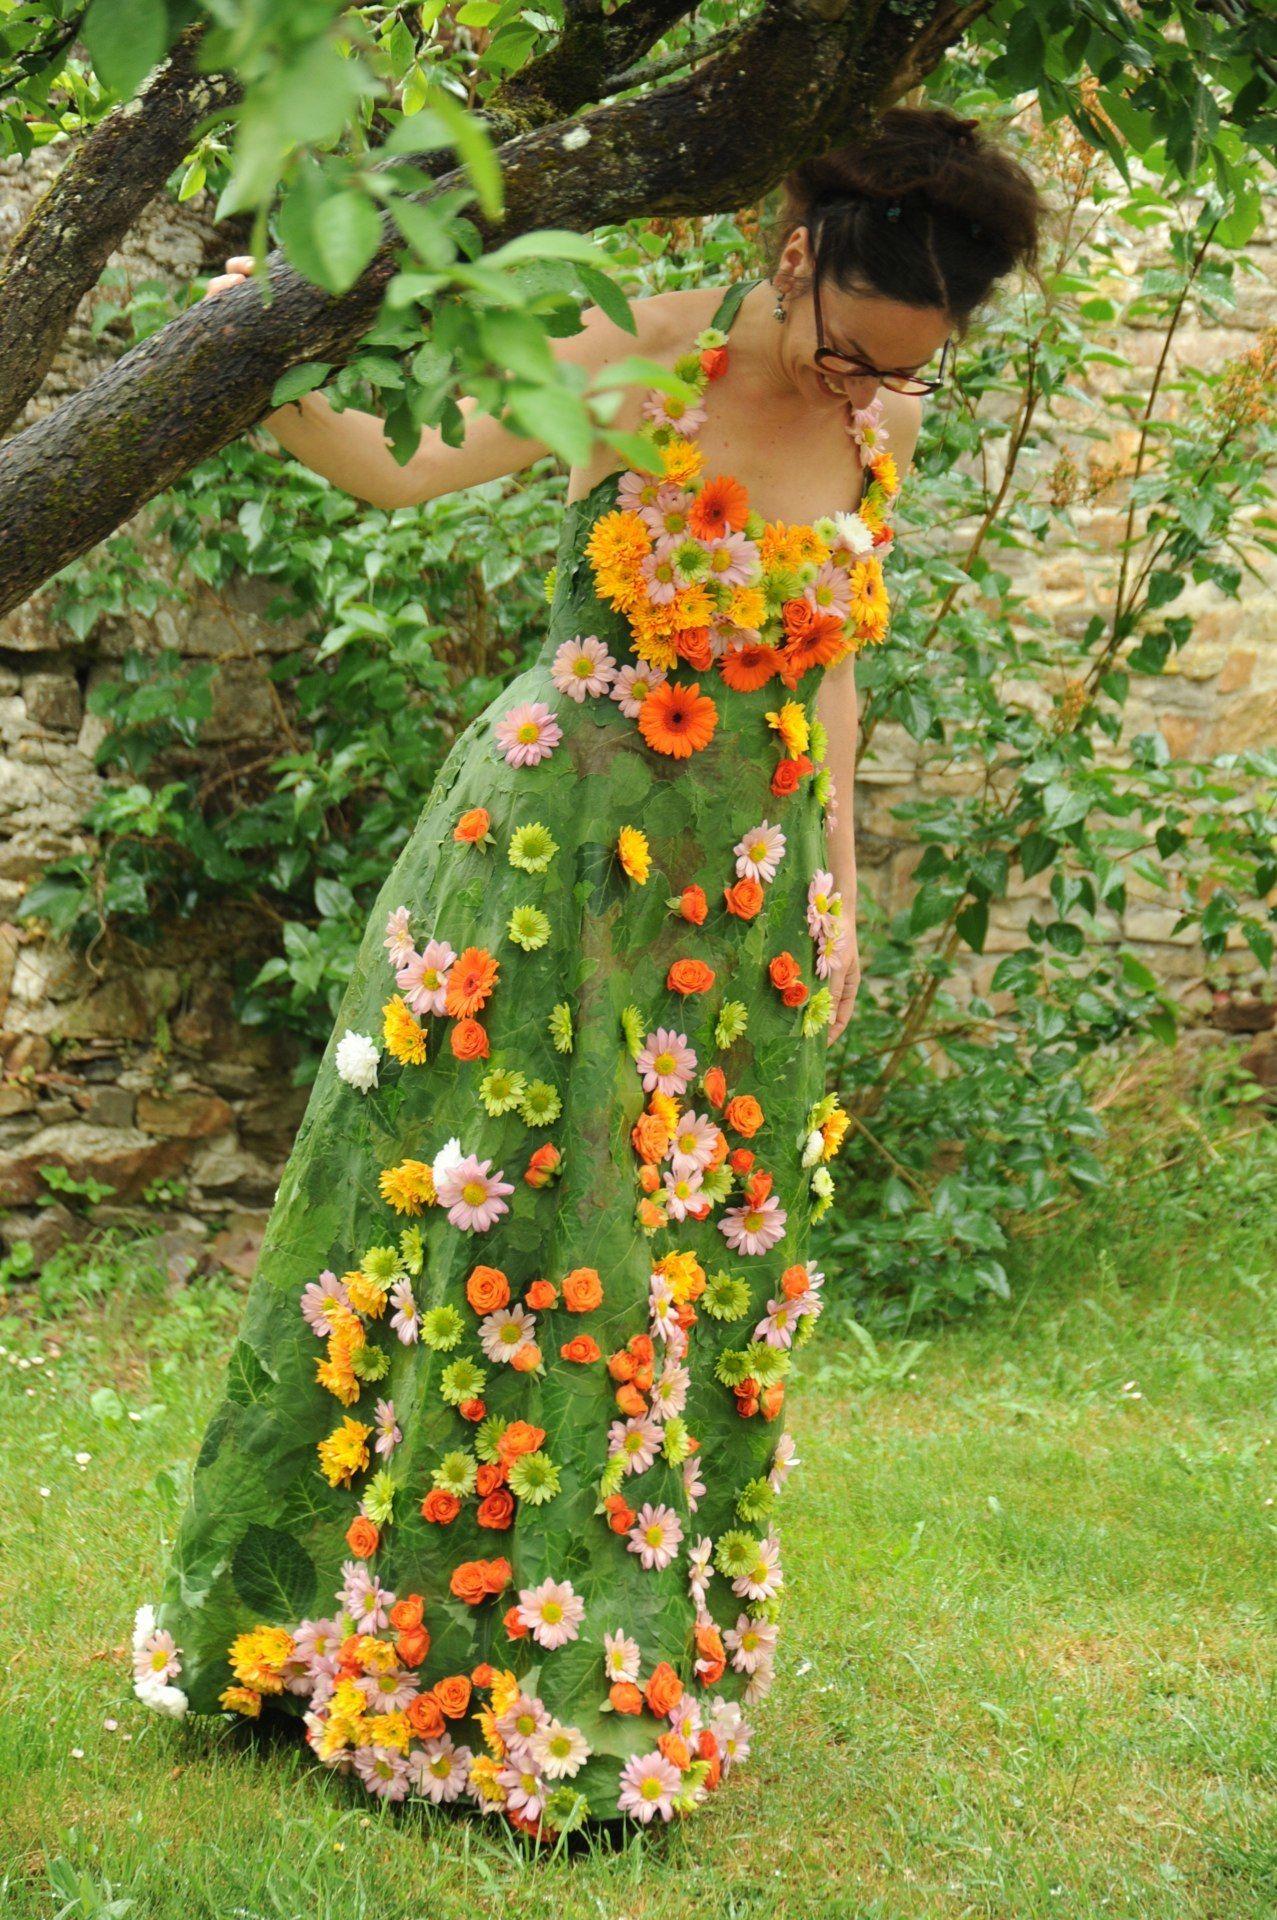 07 Jpg Jpeg Image 1277x1920 Pixels Scaled 32 Unusual Clothes Flower Dresses Dress Making